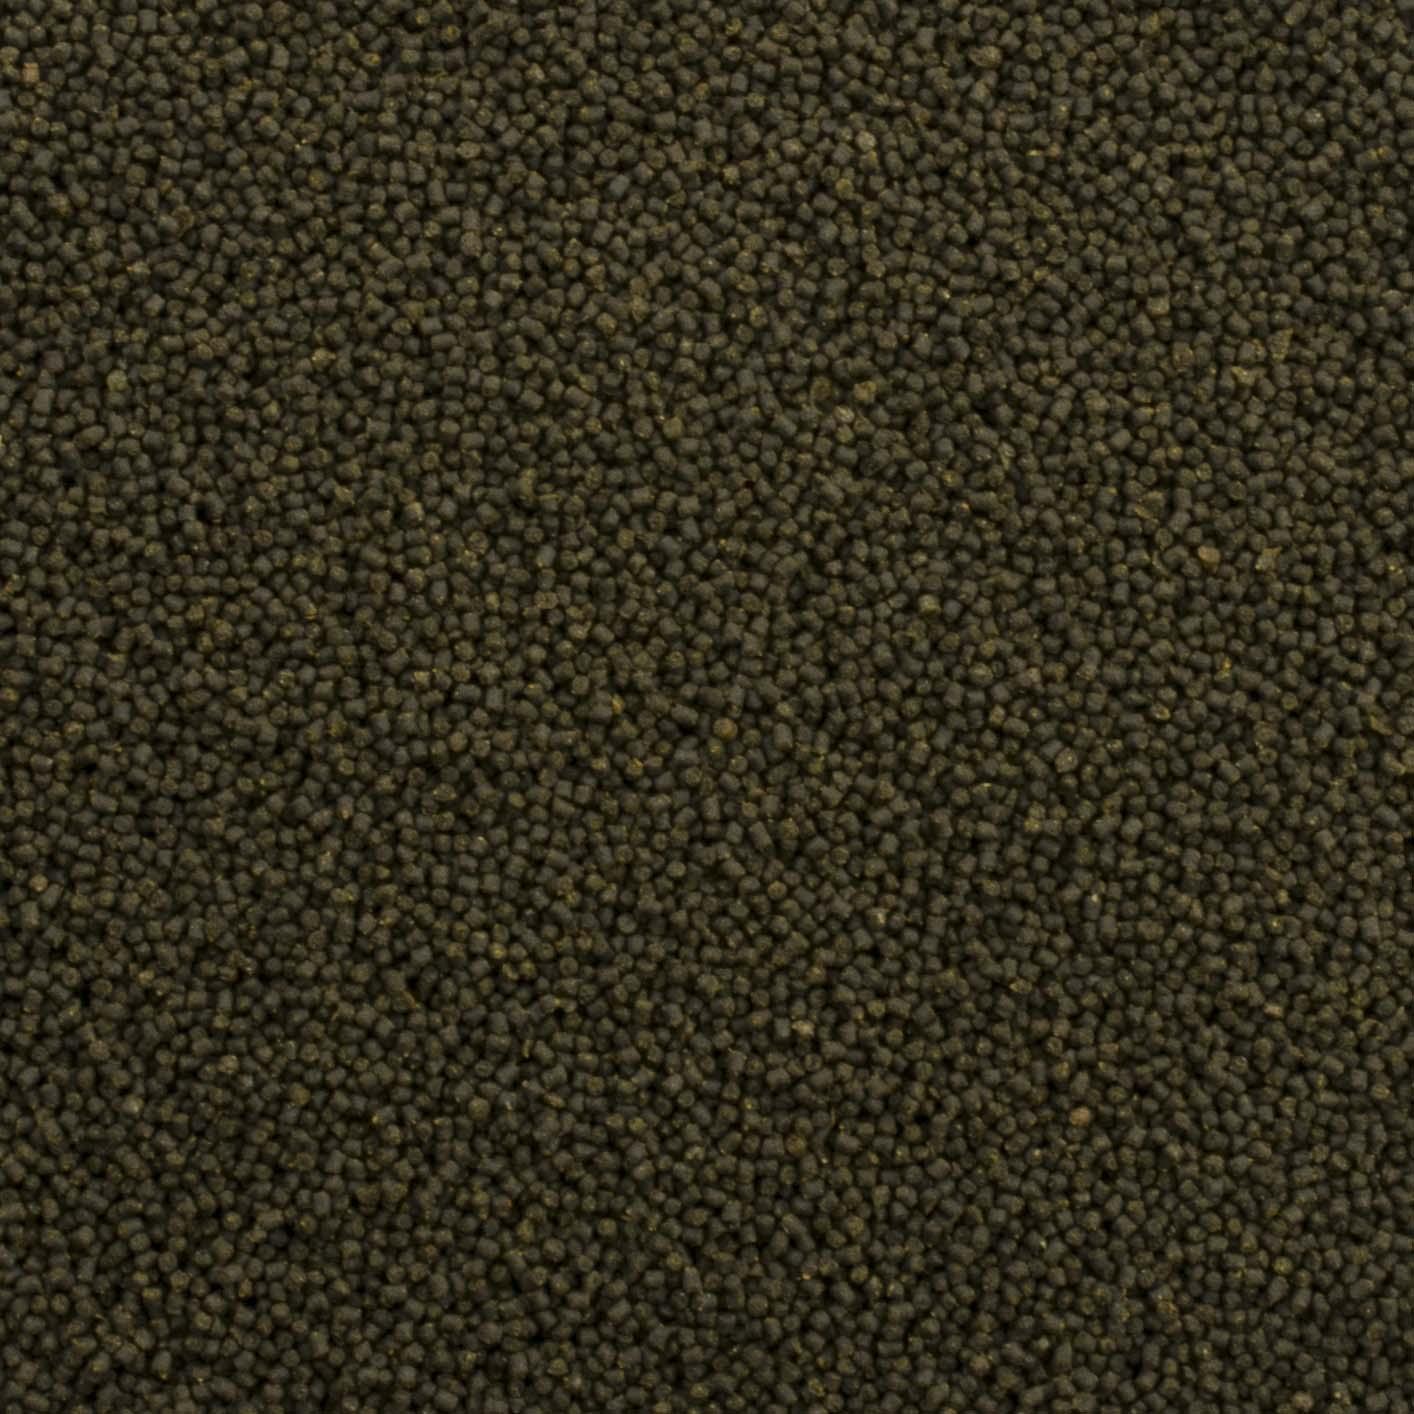 Marine Power Coral Food LPS Mini Granules 70gr  - KZ Power